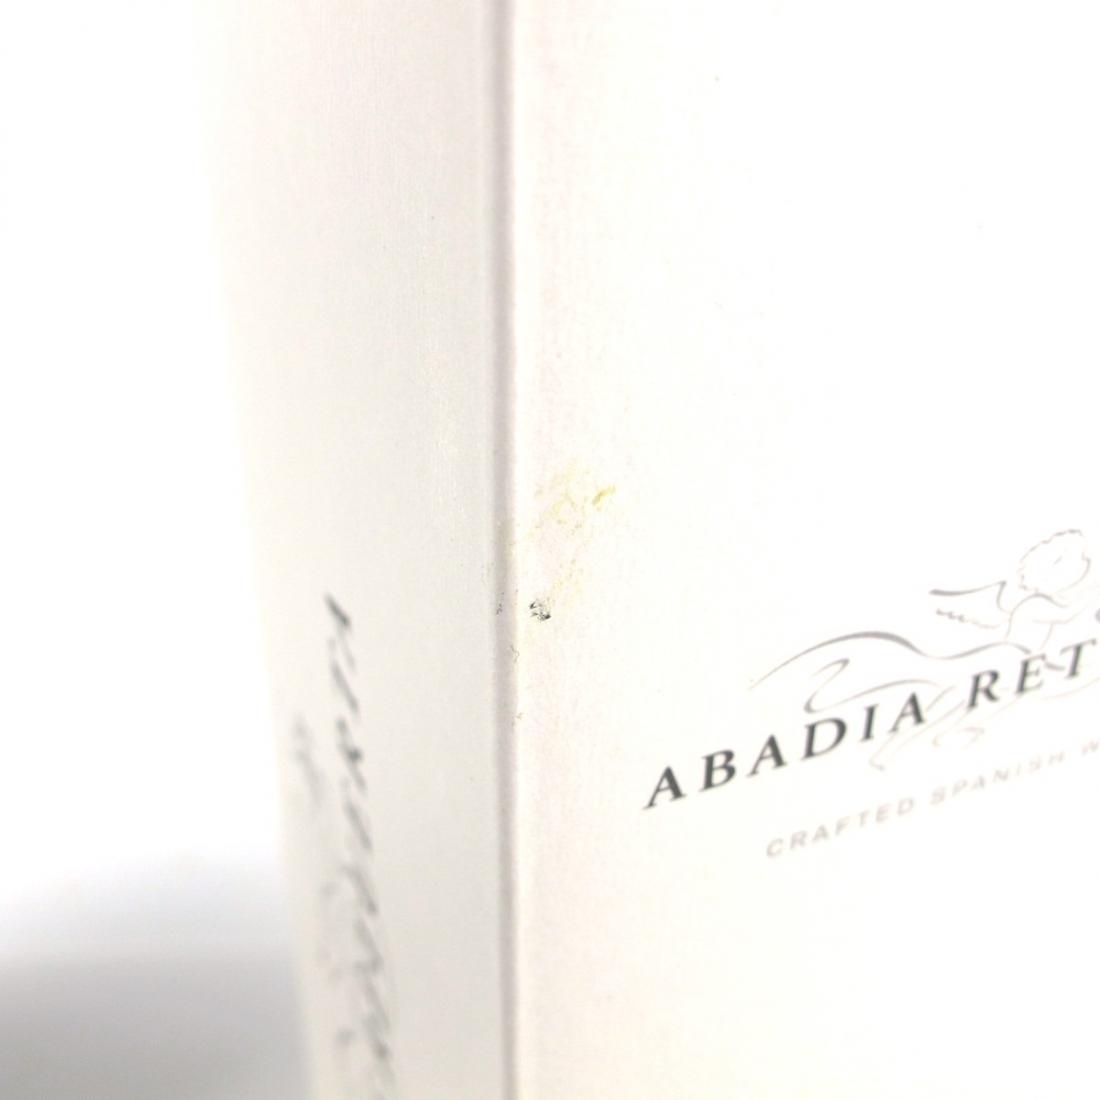 "Abadia Retuerta ""Pago Garduña"" Syrah 2011 Leon"